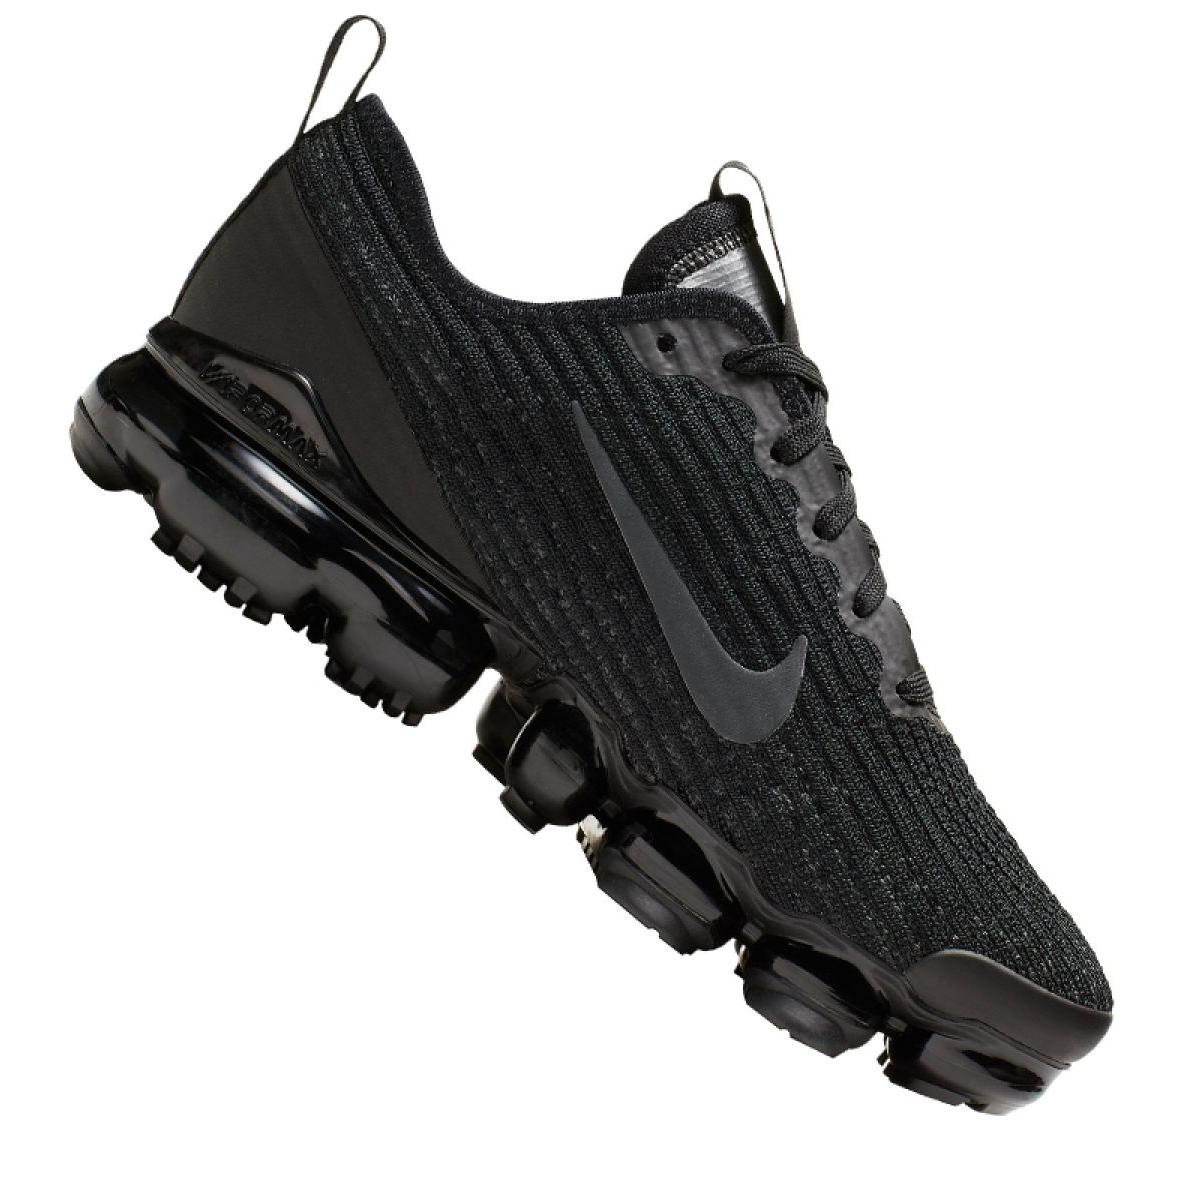 Nike Air Vapormax Flyknit 3 Jr BQ5238-001 shoes black grey